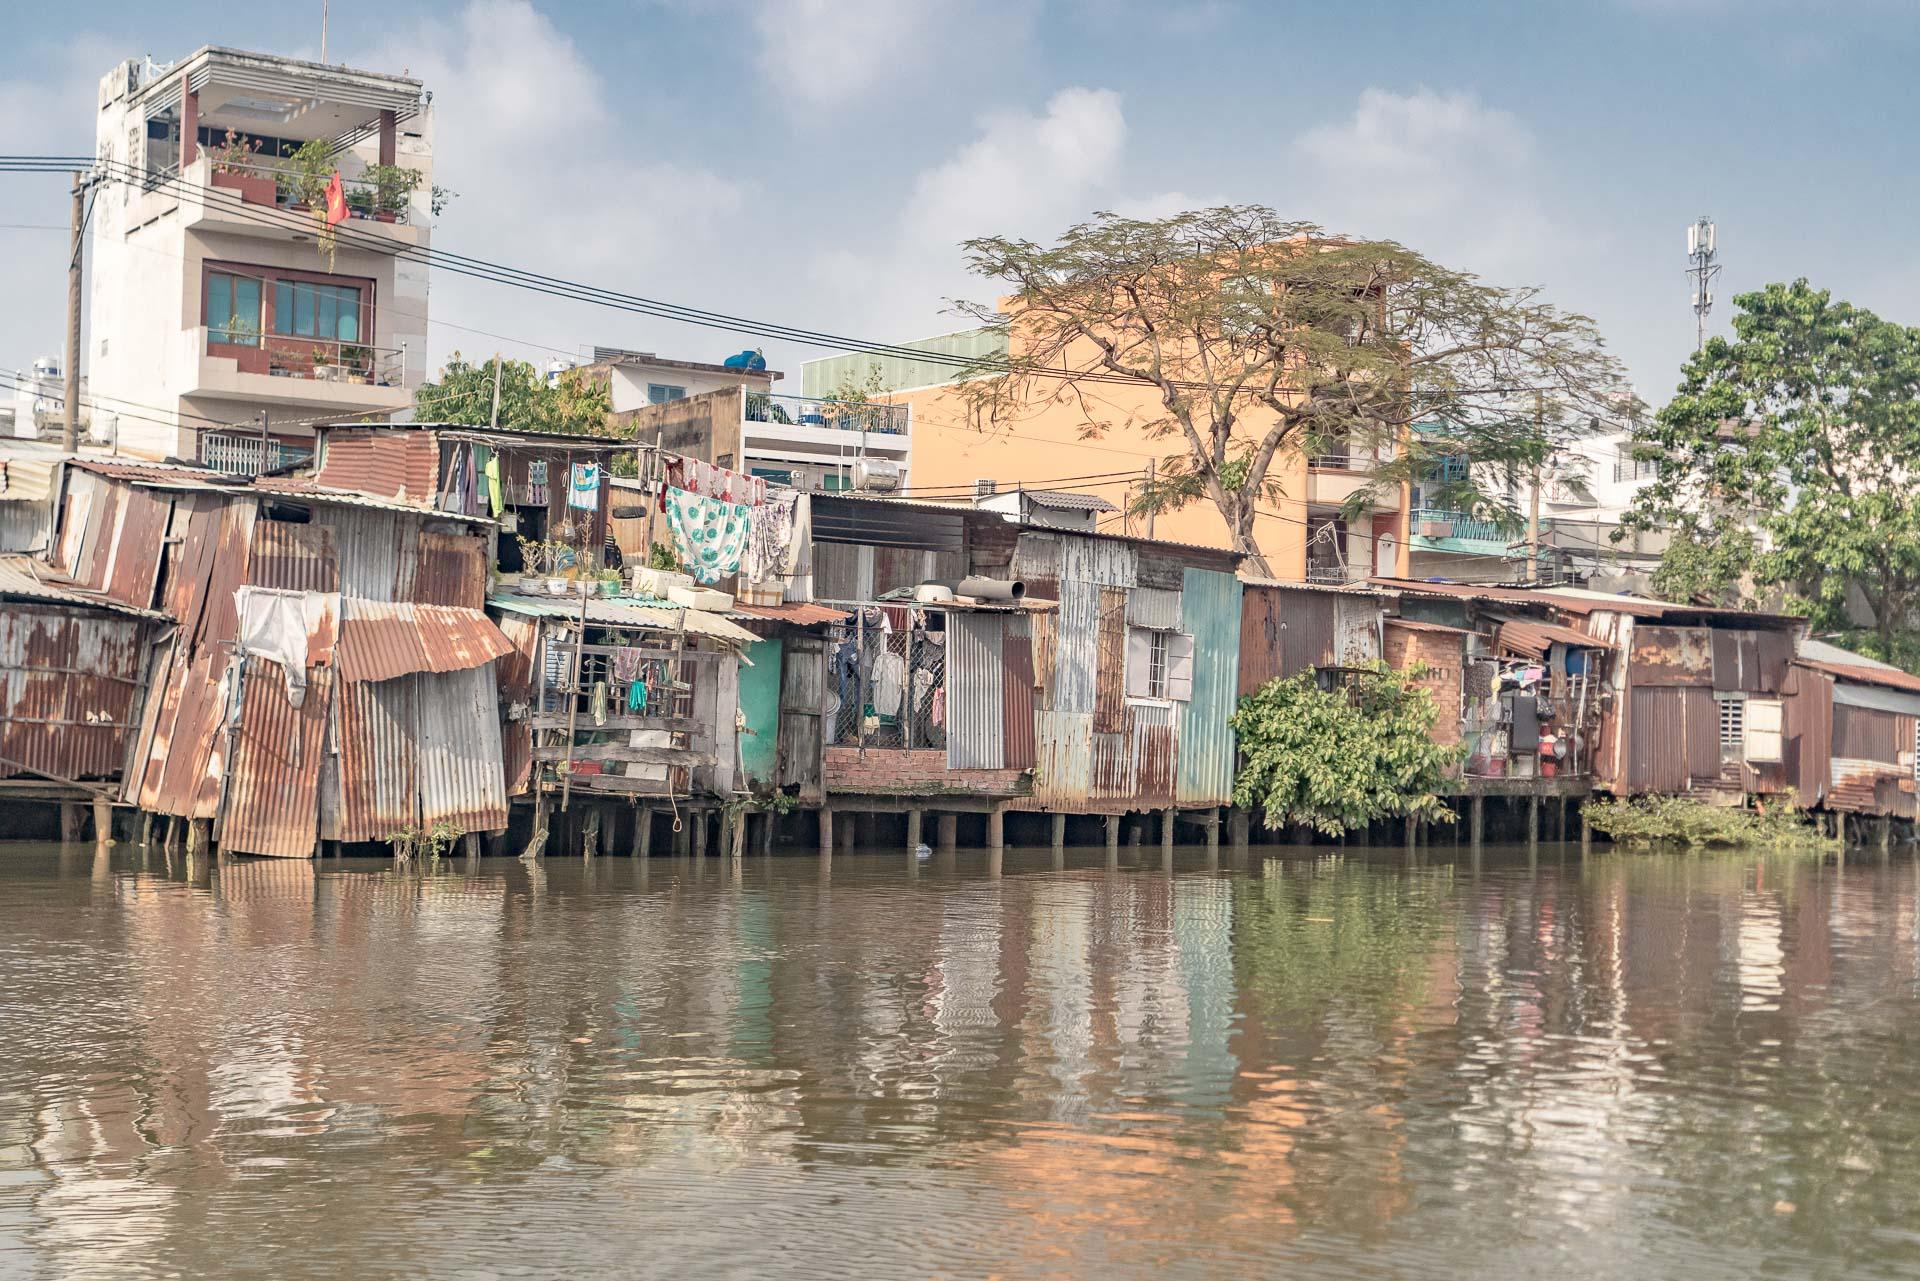 Lesvoyageuses-Vietnam-Saigon-Delta-Mekong-Les-Rives--52